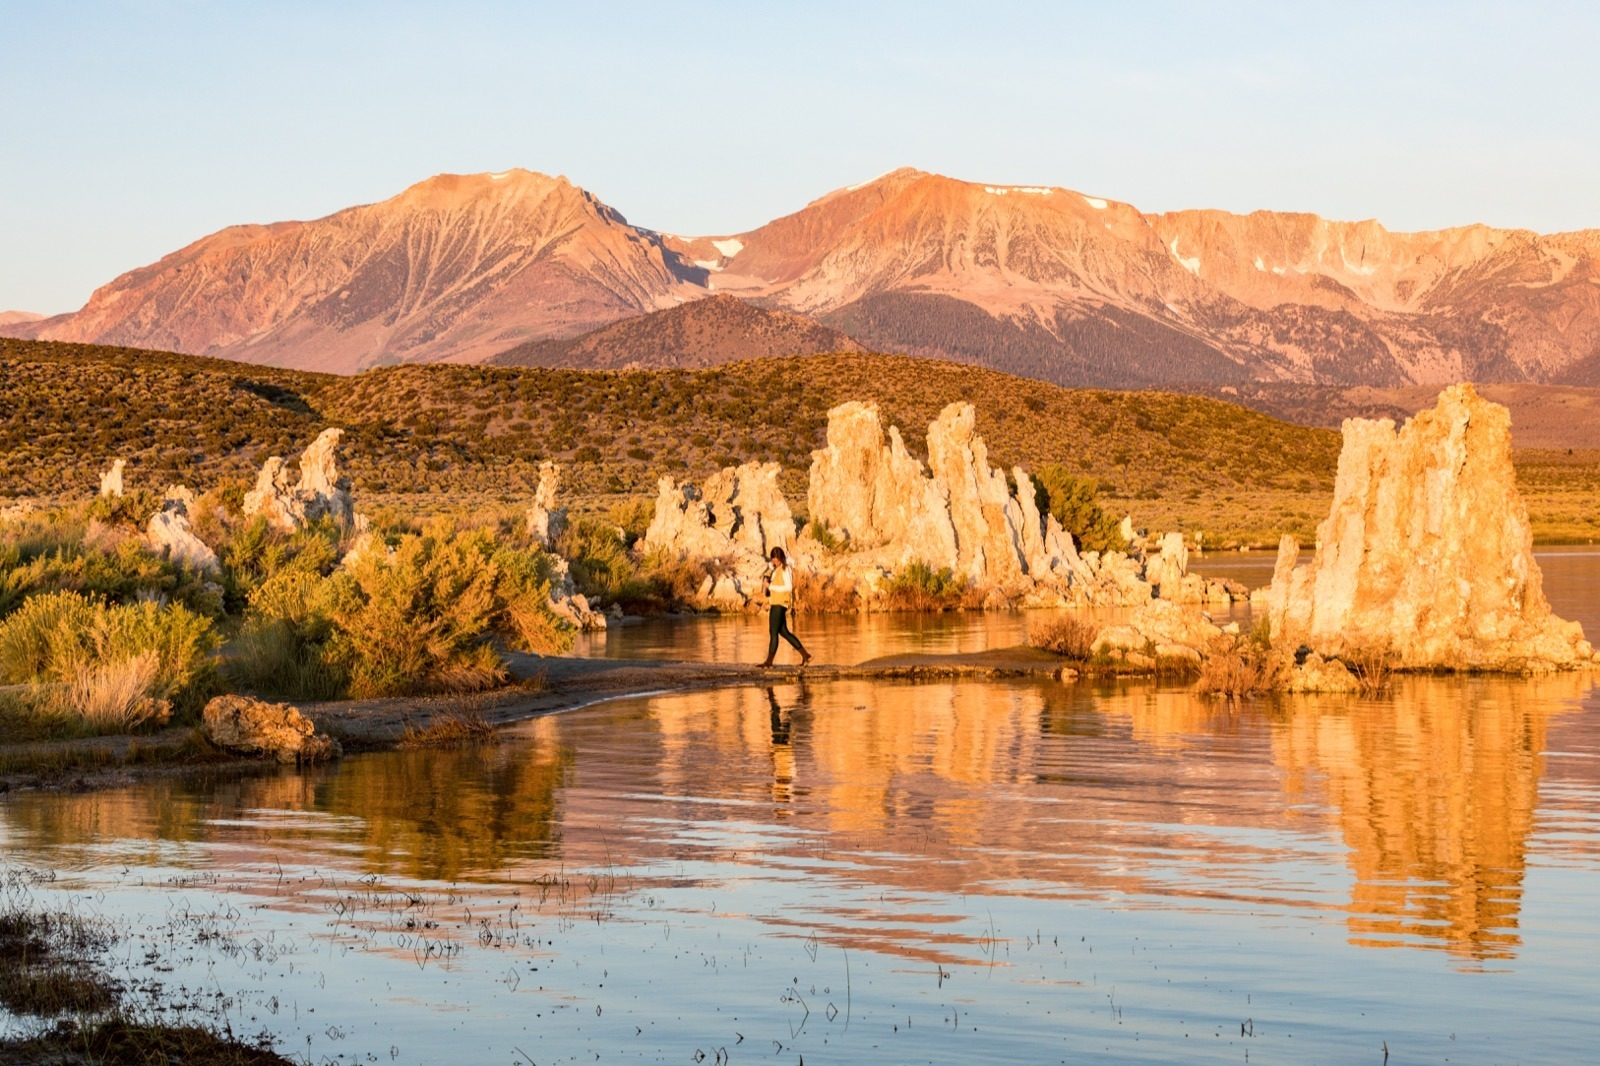 california-high-sierra-mono-south-tufa-mono-lake-sunrise-5